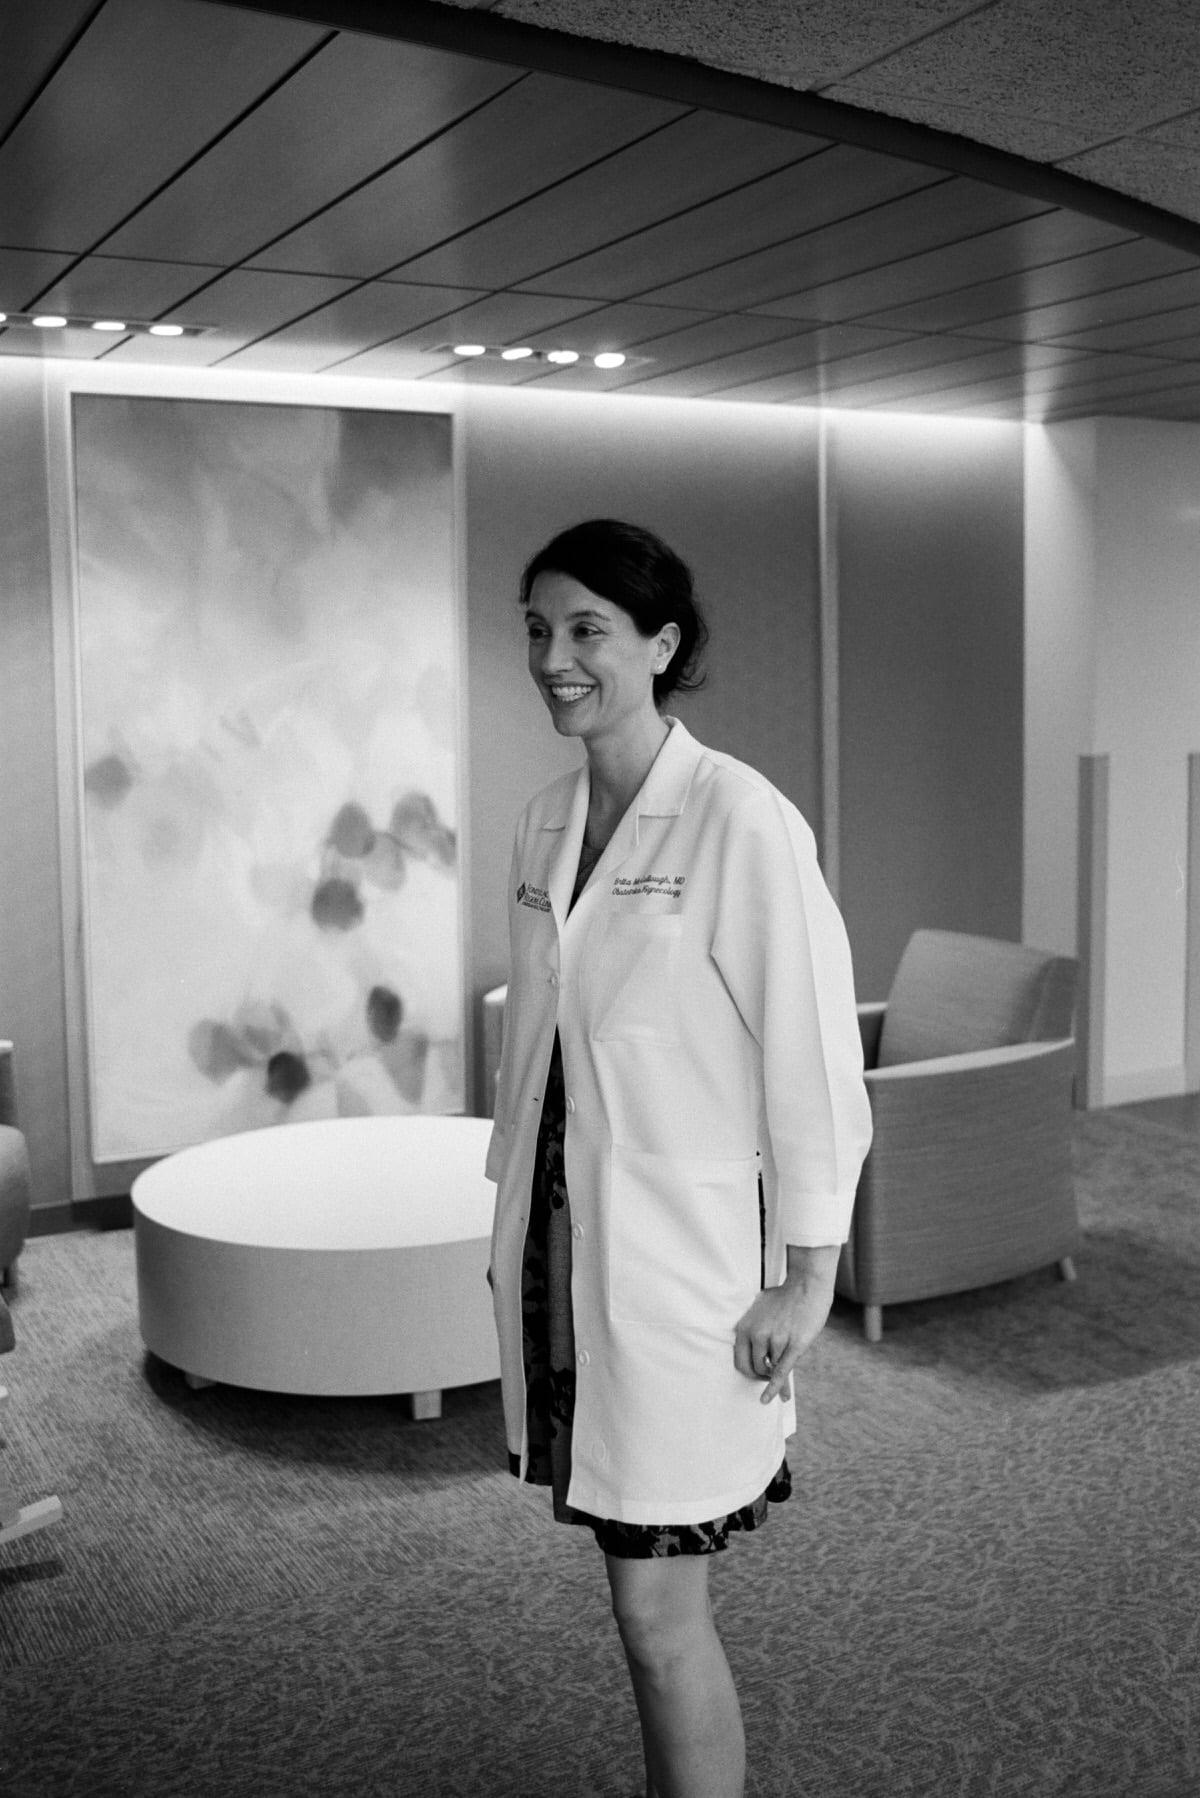 Illuminating-Women-art-exhibition-black-and-white-fine-art-film-photography-by-Studio-L-photographer-Laura-Schneider-10033 3